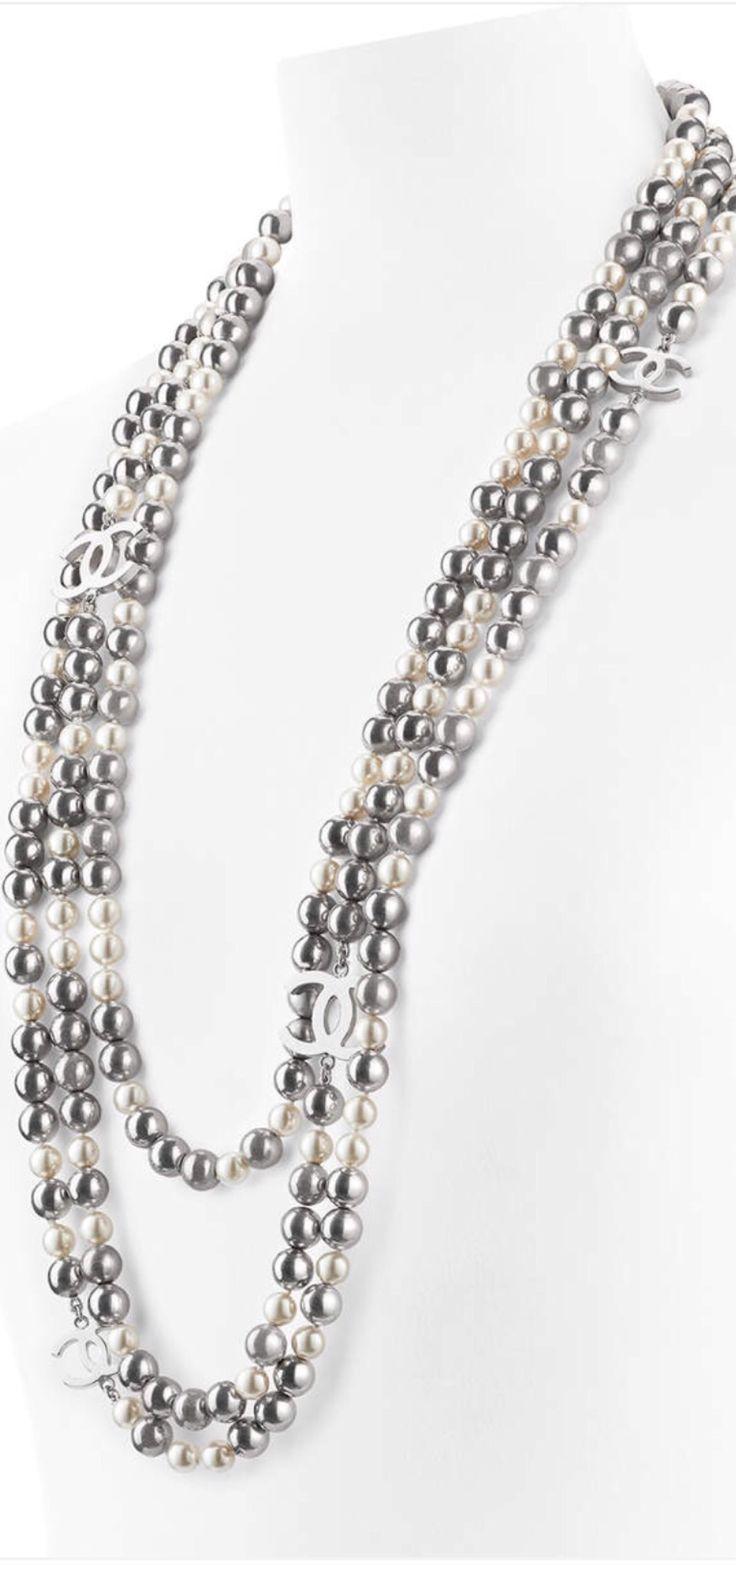 Chanel Ss 2016 Pearl Necklace #luxurydotcom